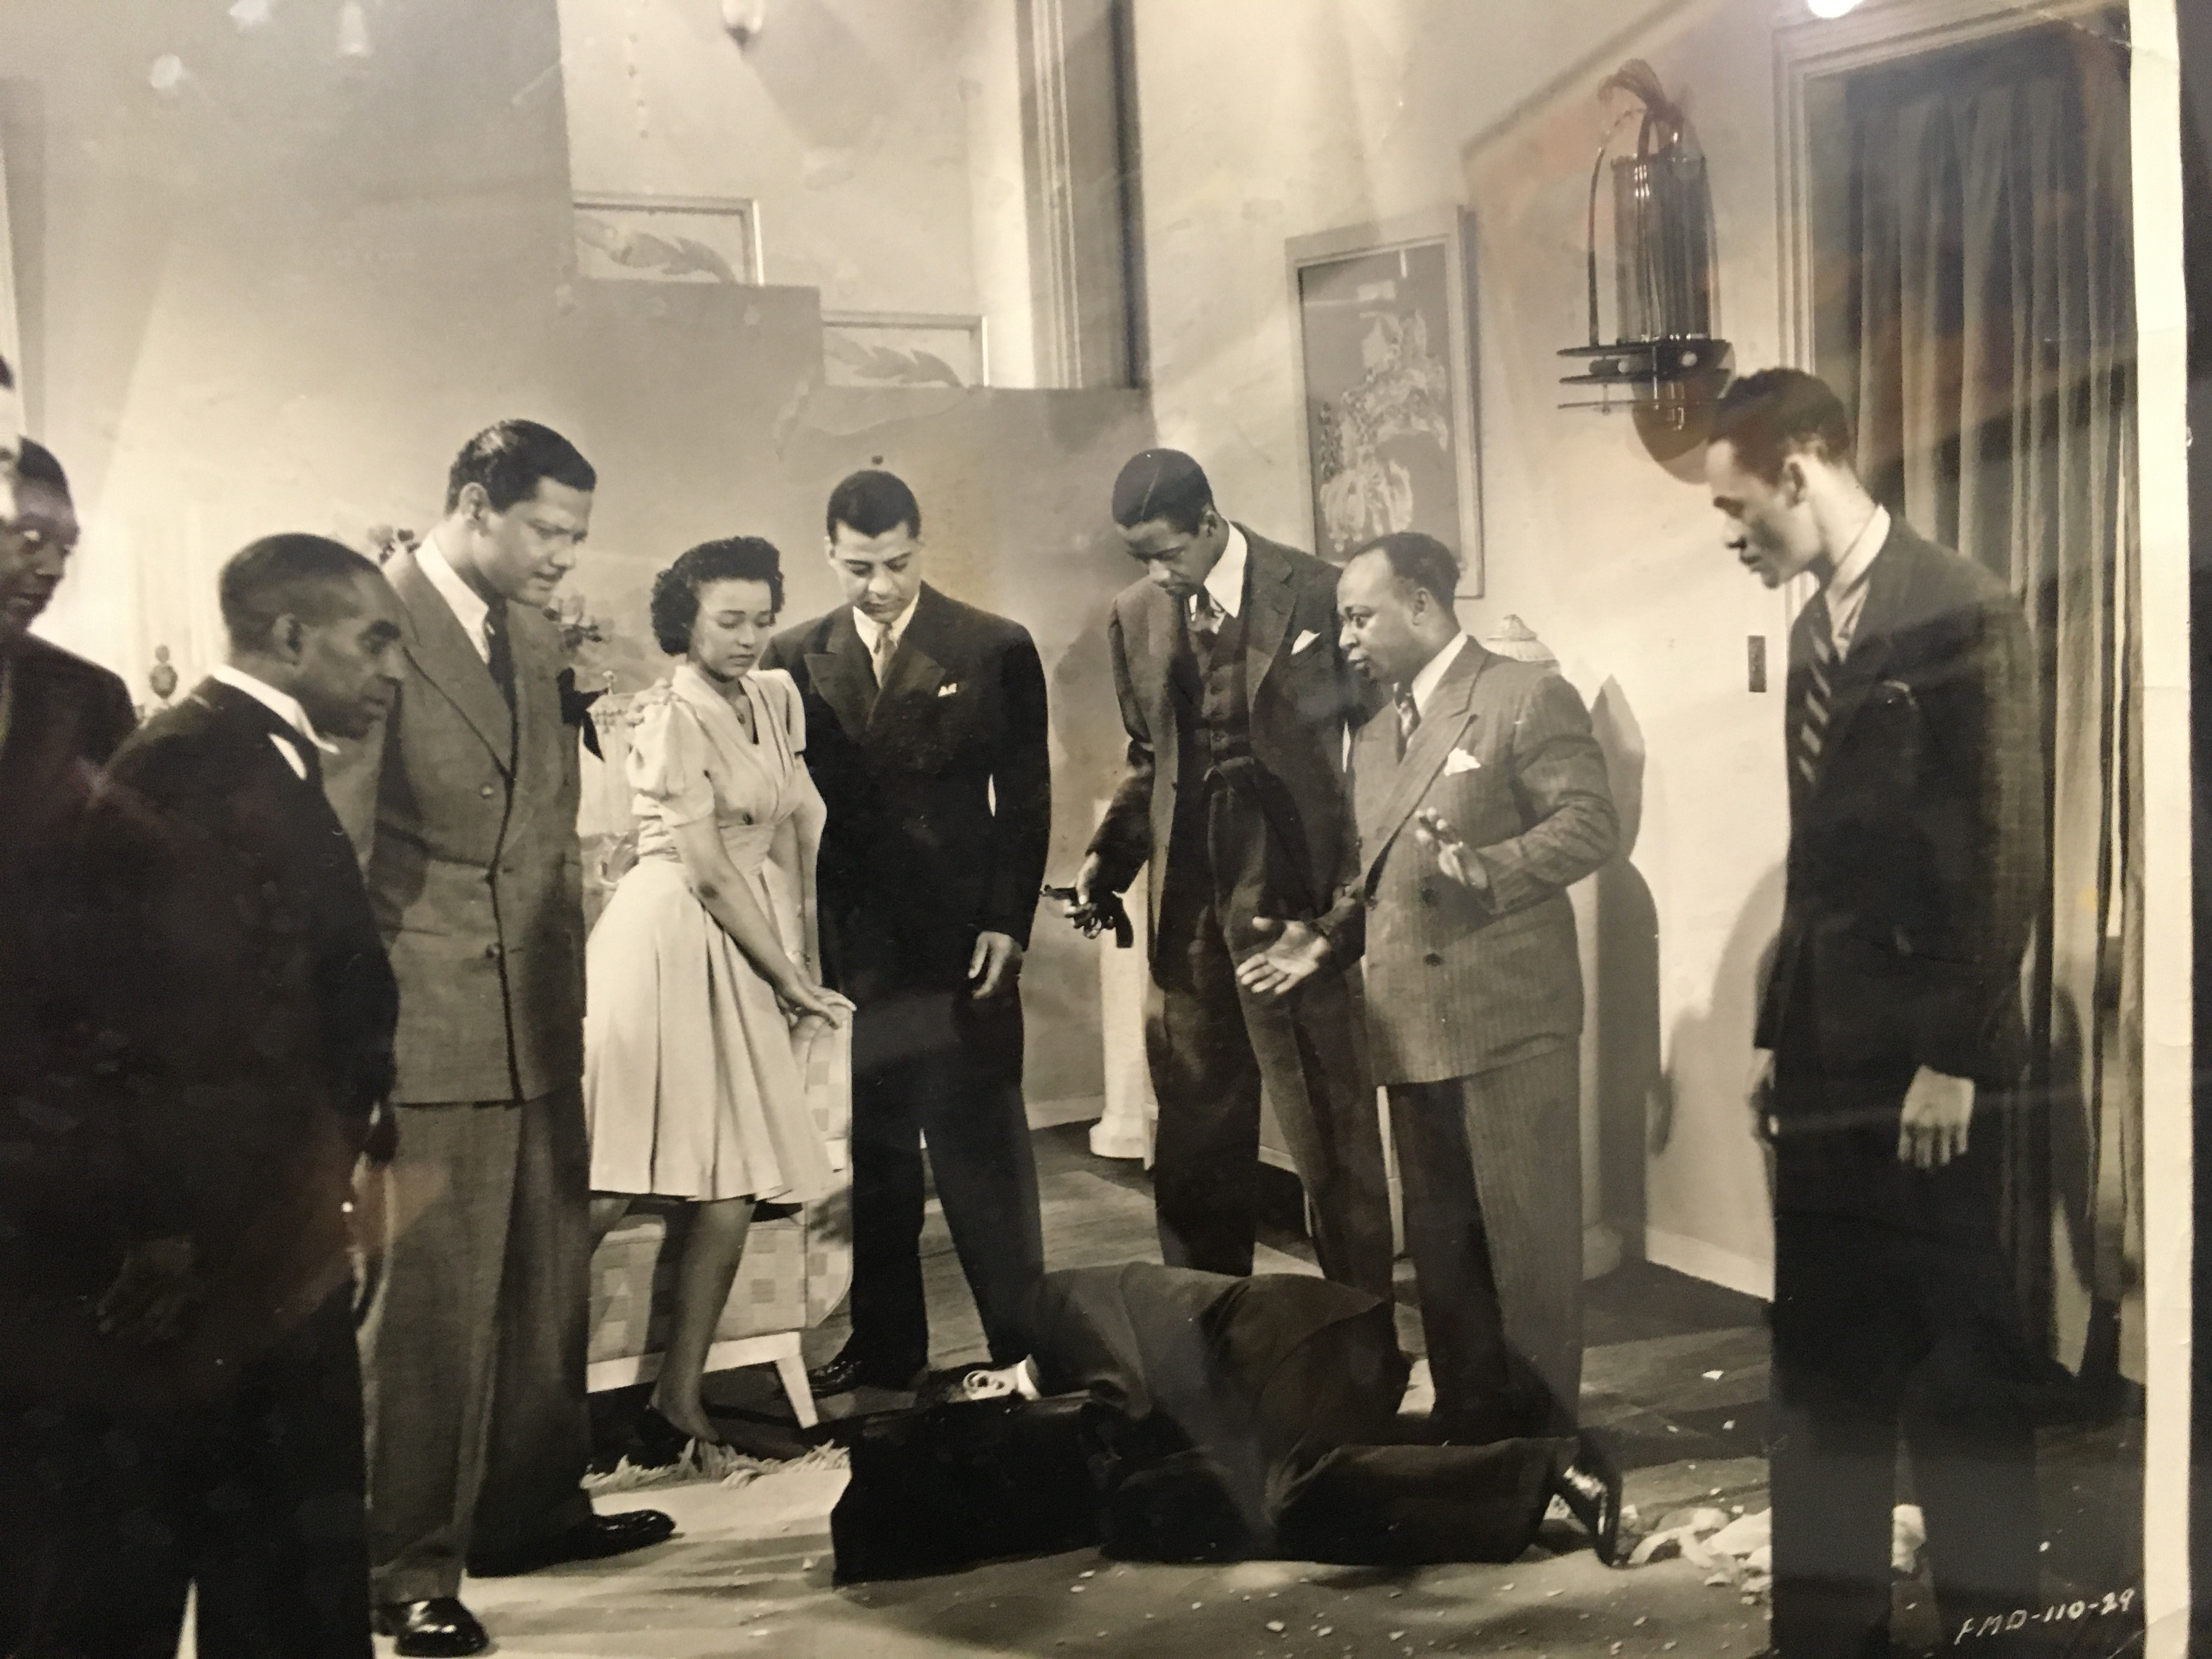 Jess Lee Brooks, Laurence Criner, Dorothy Dandridge, Reginald Fenderson, Monte Hawley, Mantan Moreland, Niel Webster, and Pete Webster in Four Shall Die (1940)